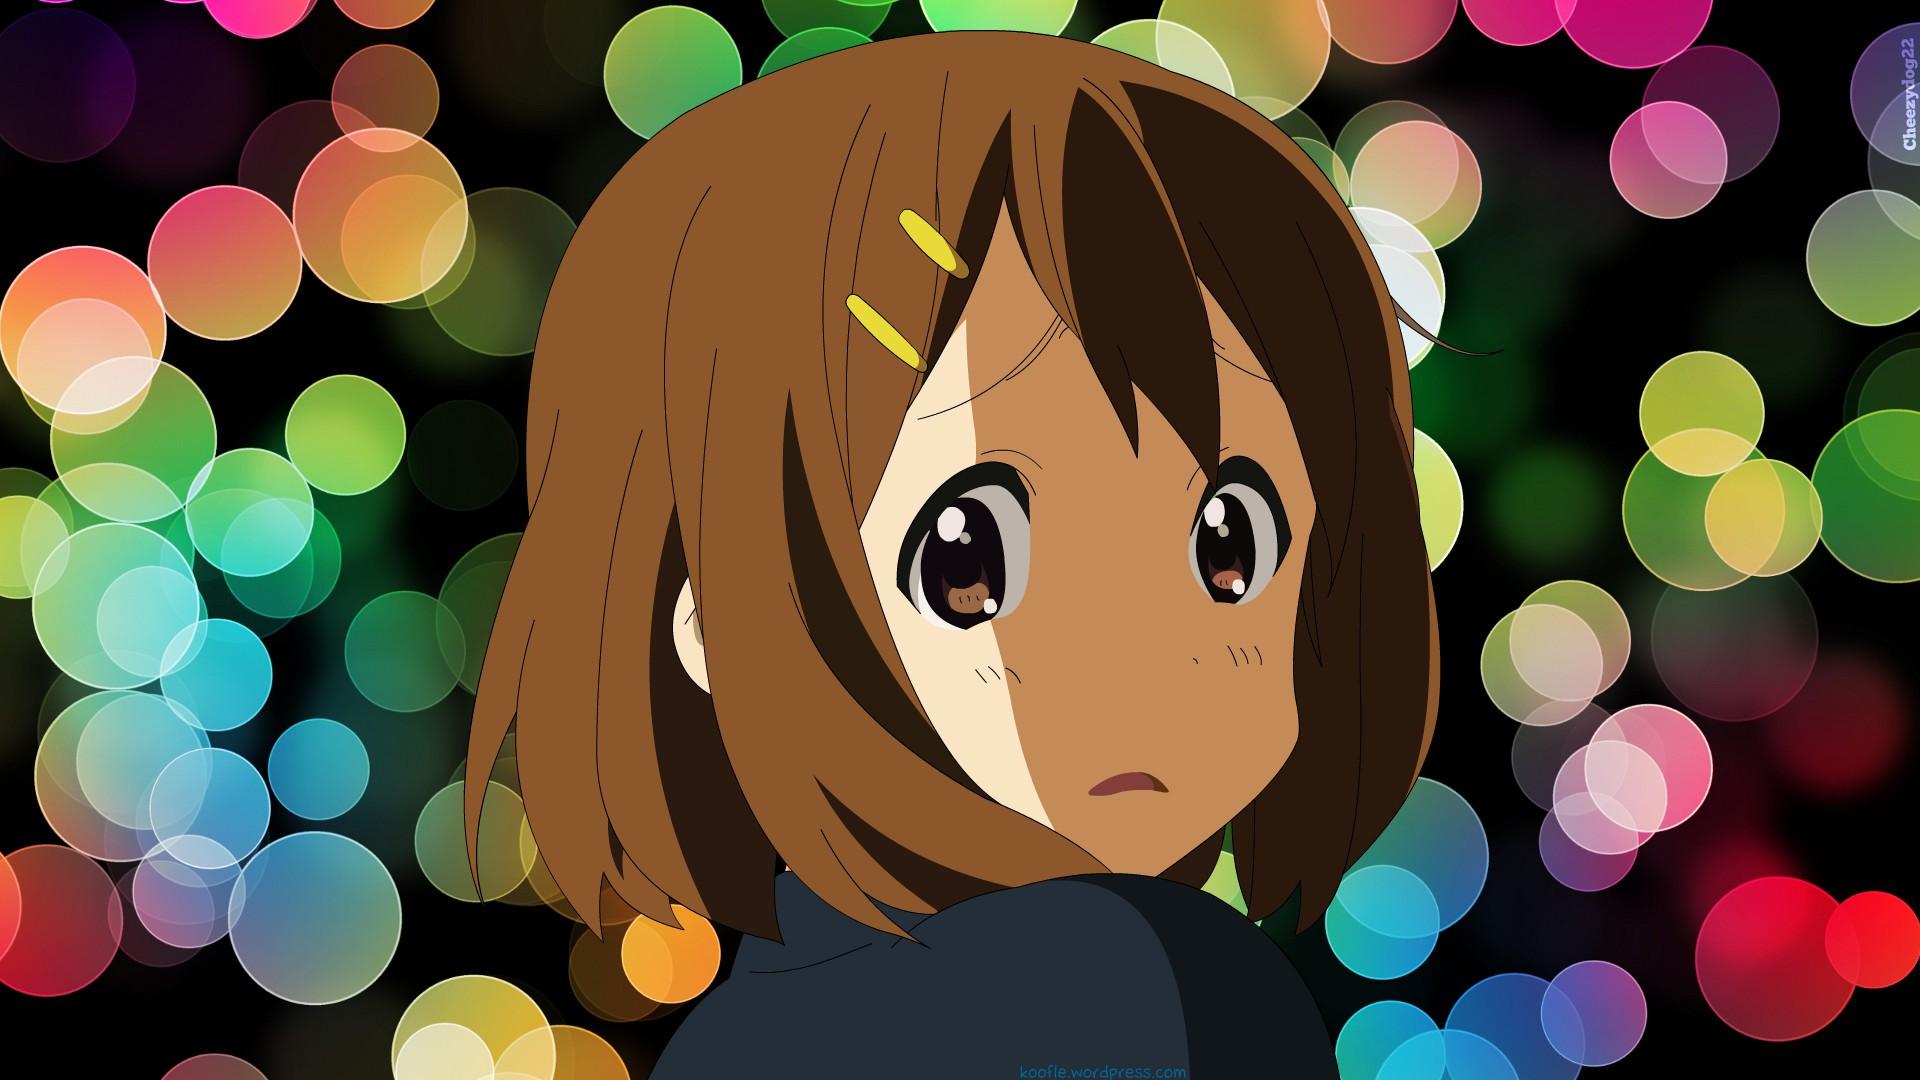 Anime 1920x1080 K-ON! Hirasawa Yui anime girls anime brunette